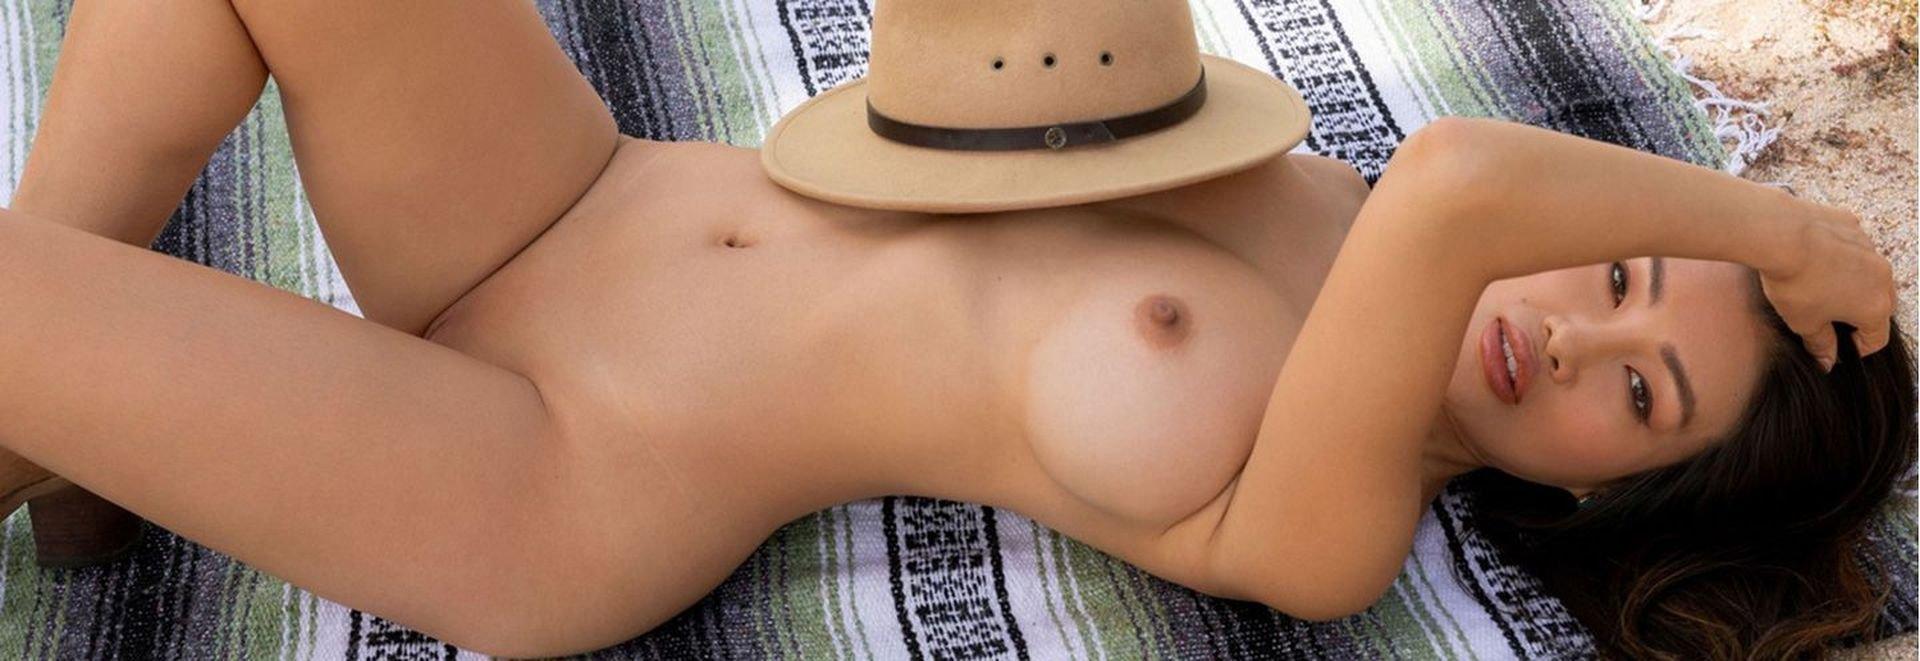 Hannah montana naked bra